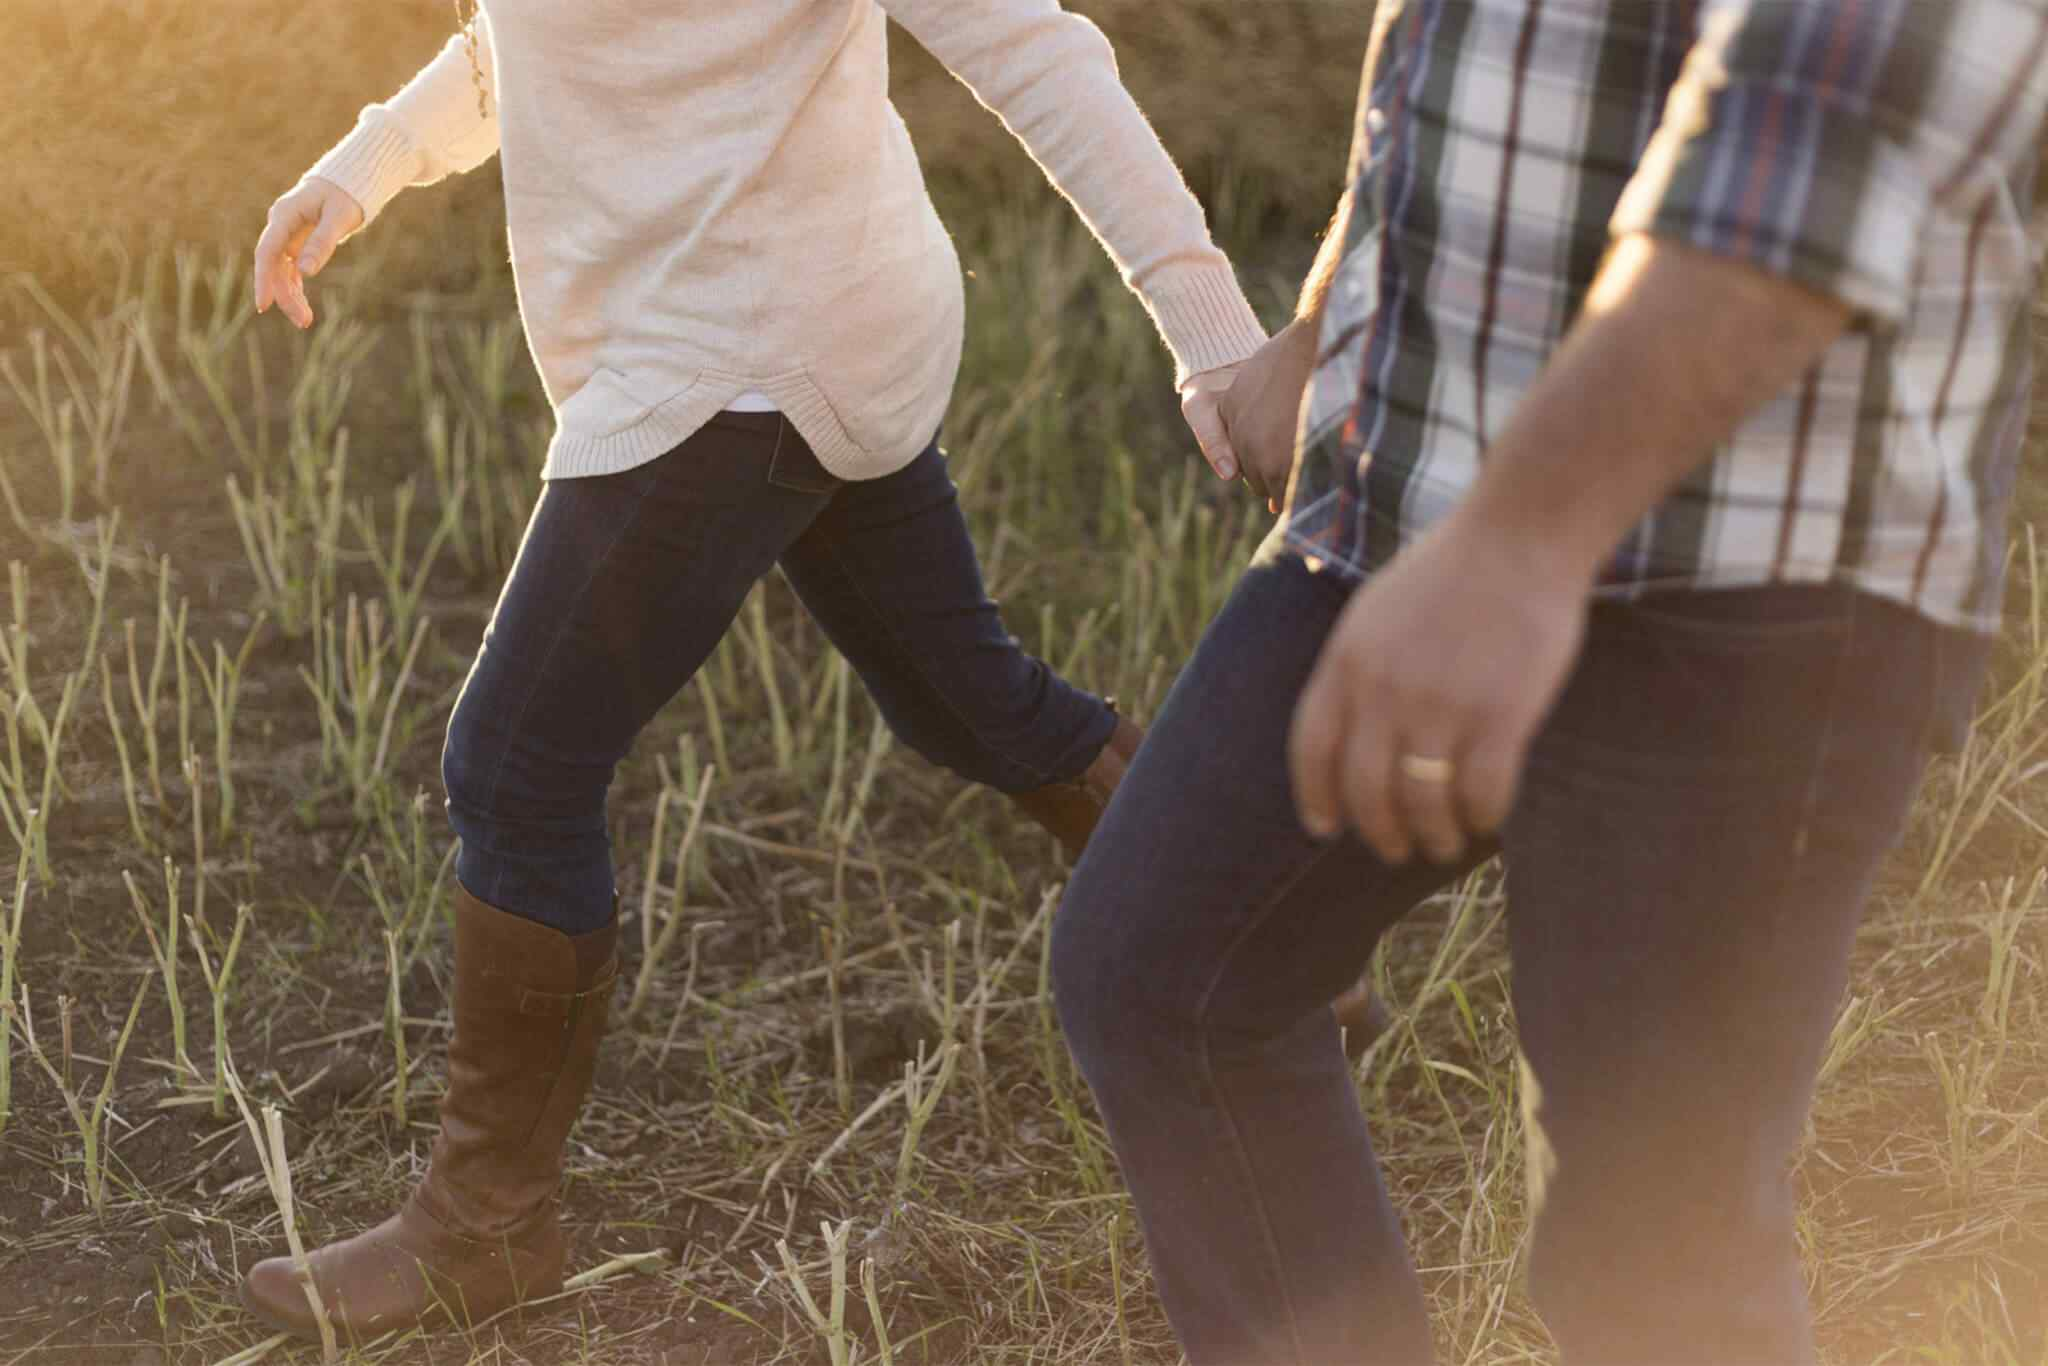 https://www.spiritcoaching.ca/wp-content/uploads/2018/01/img-class-marriage-04.jpg